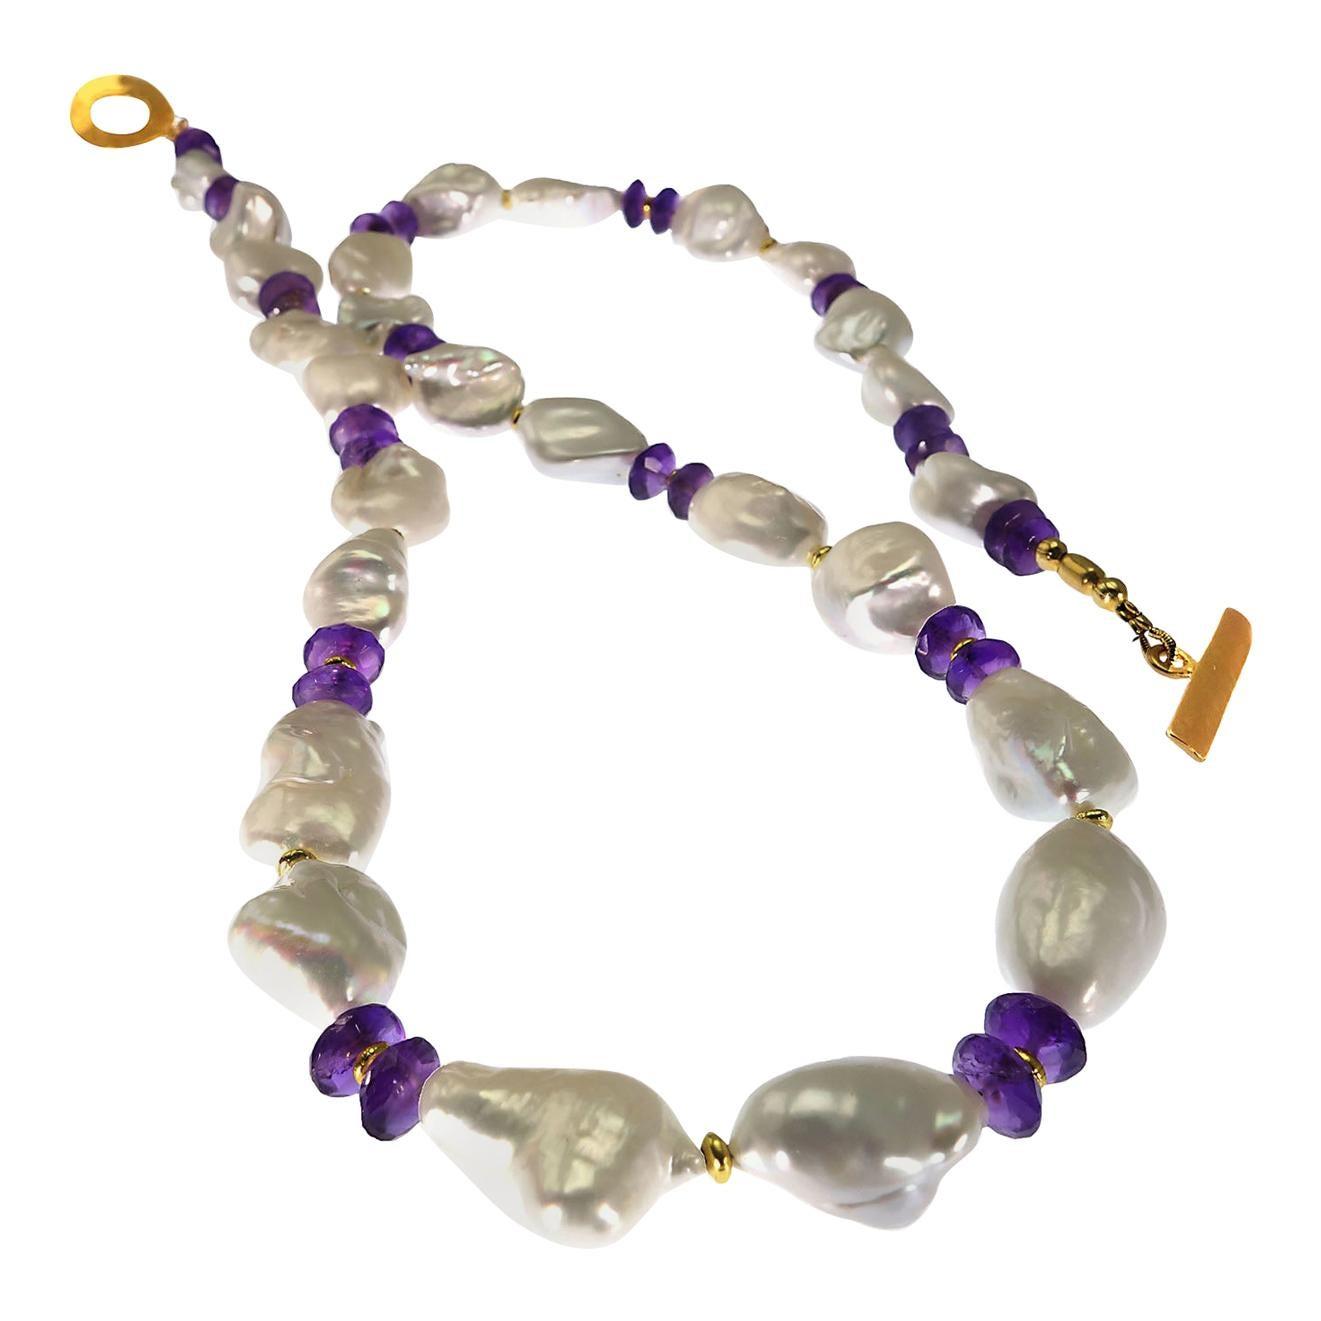 Gemjunky Necklace of  Baroque Pearls and Amethyst Rondelles  June Birthstone